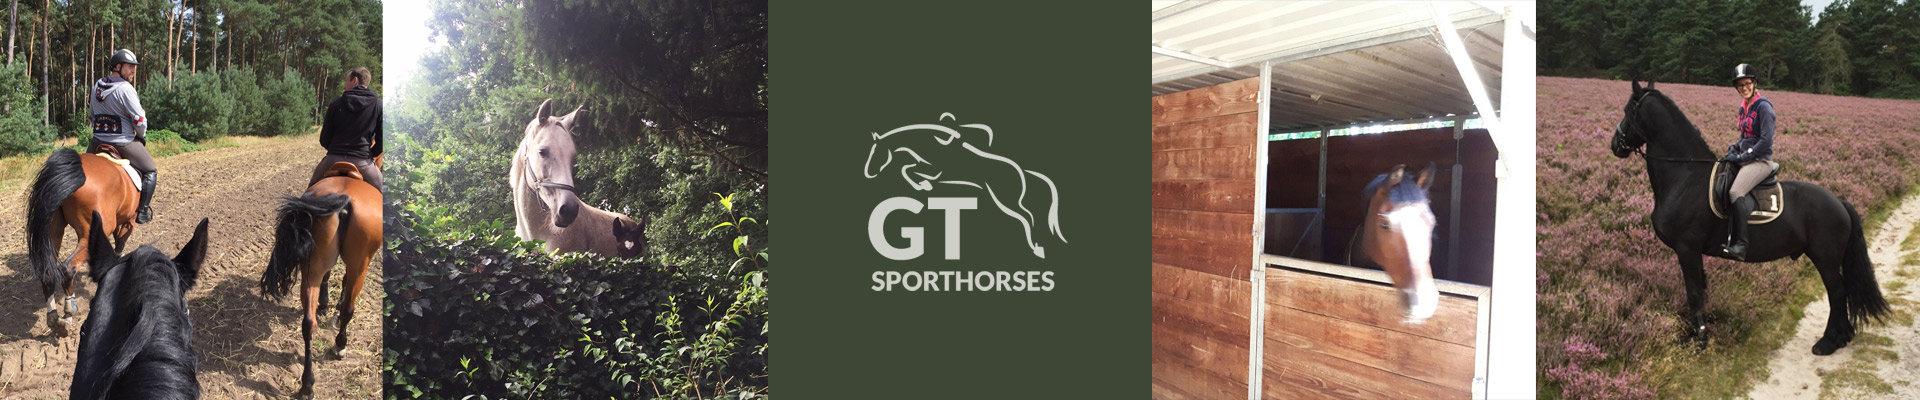 gt-sporthorses-2.jpg